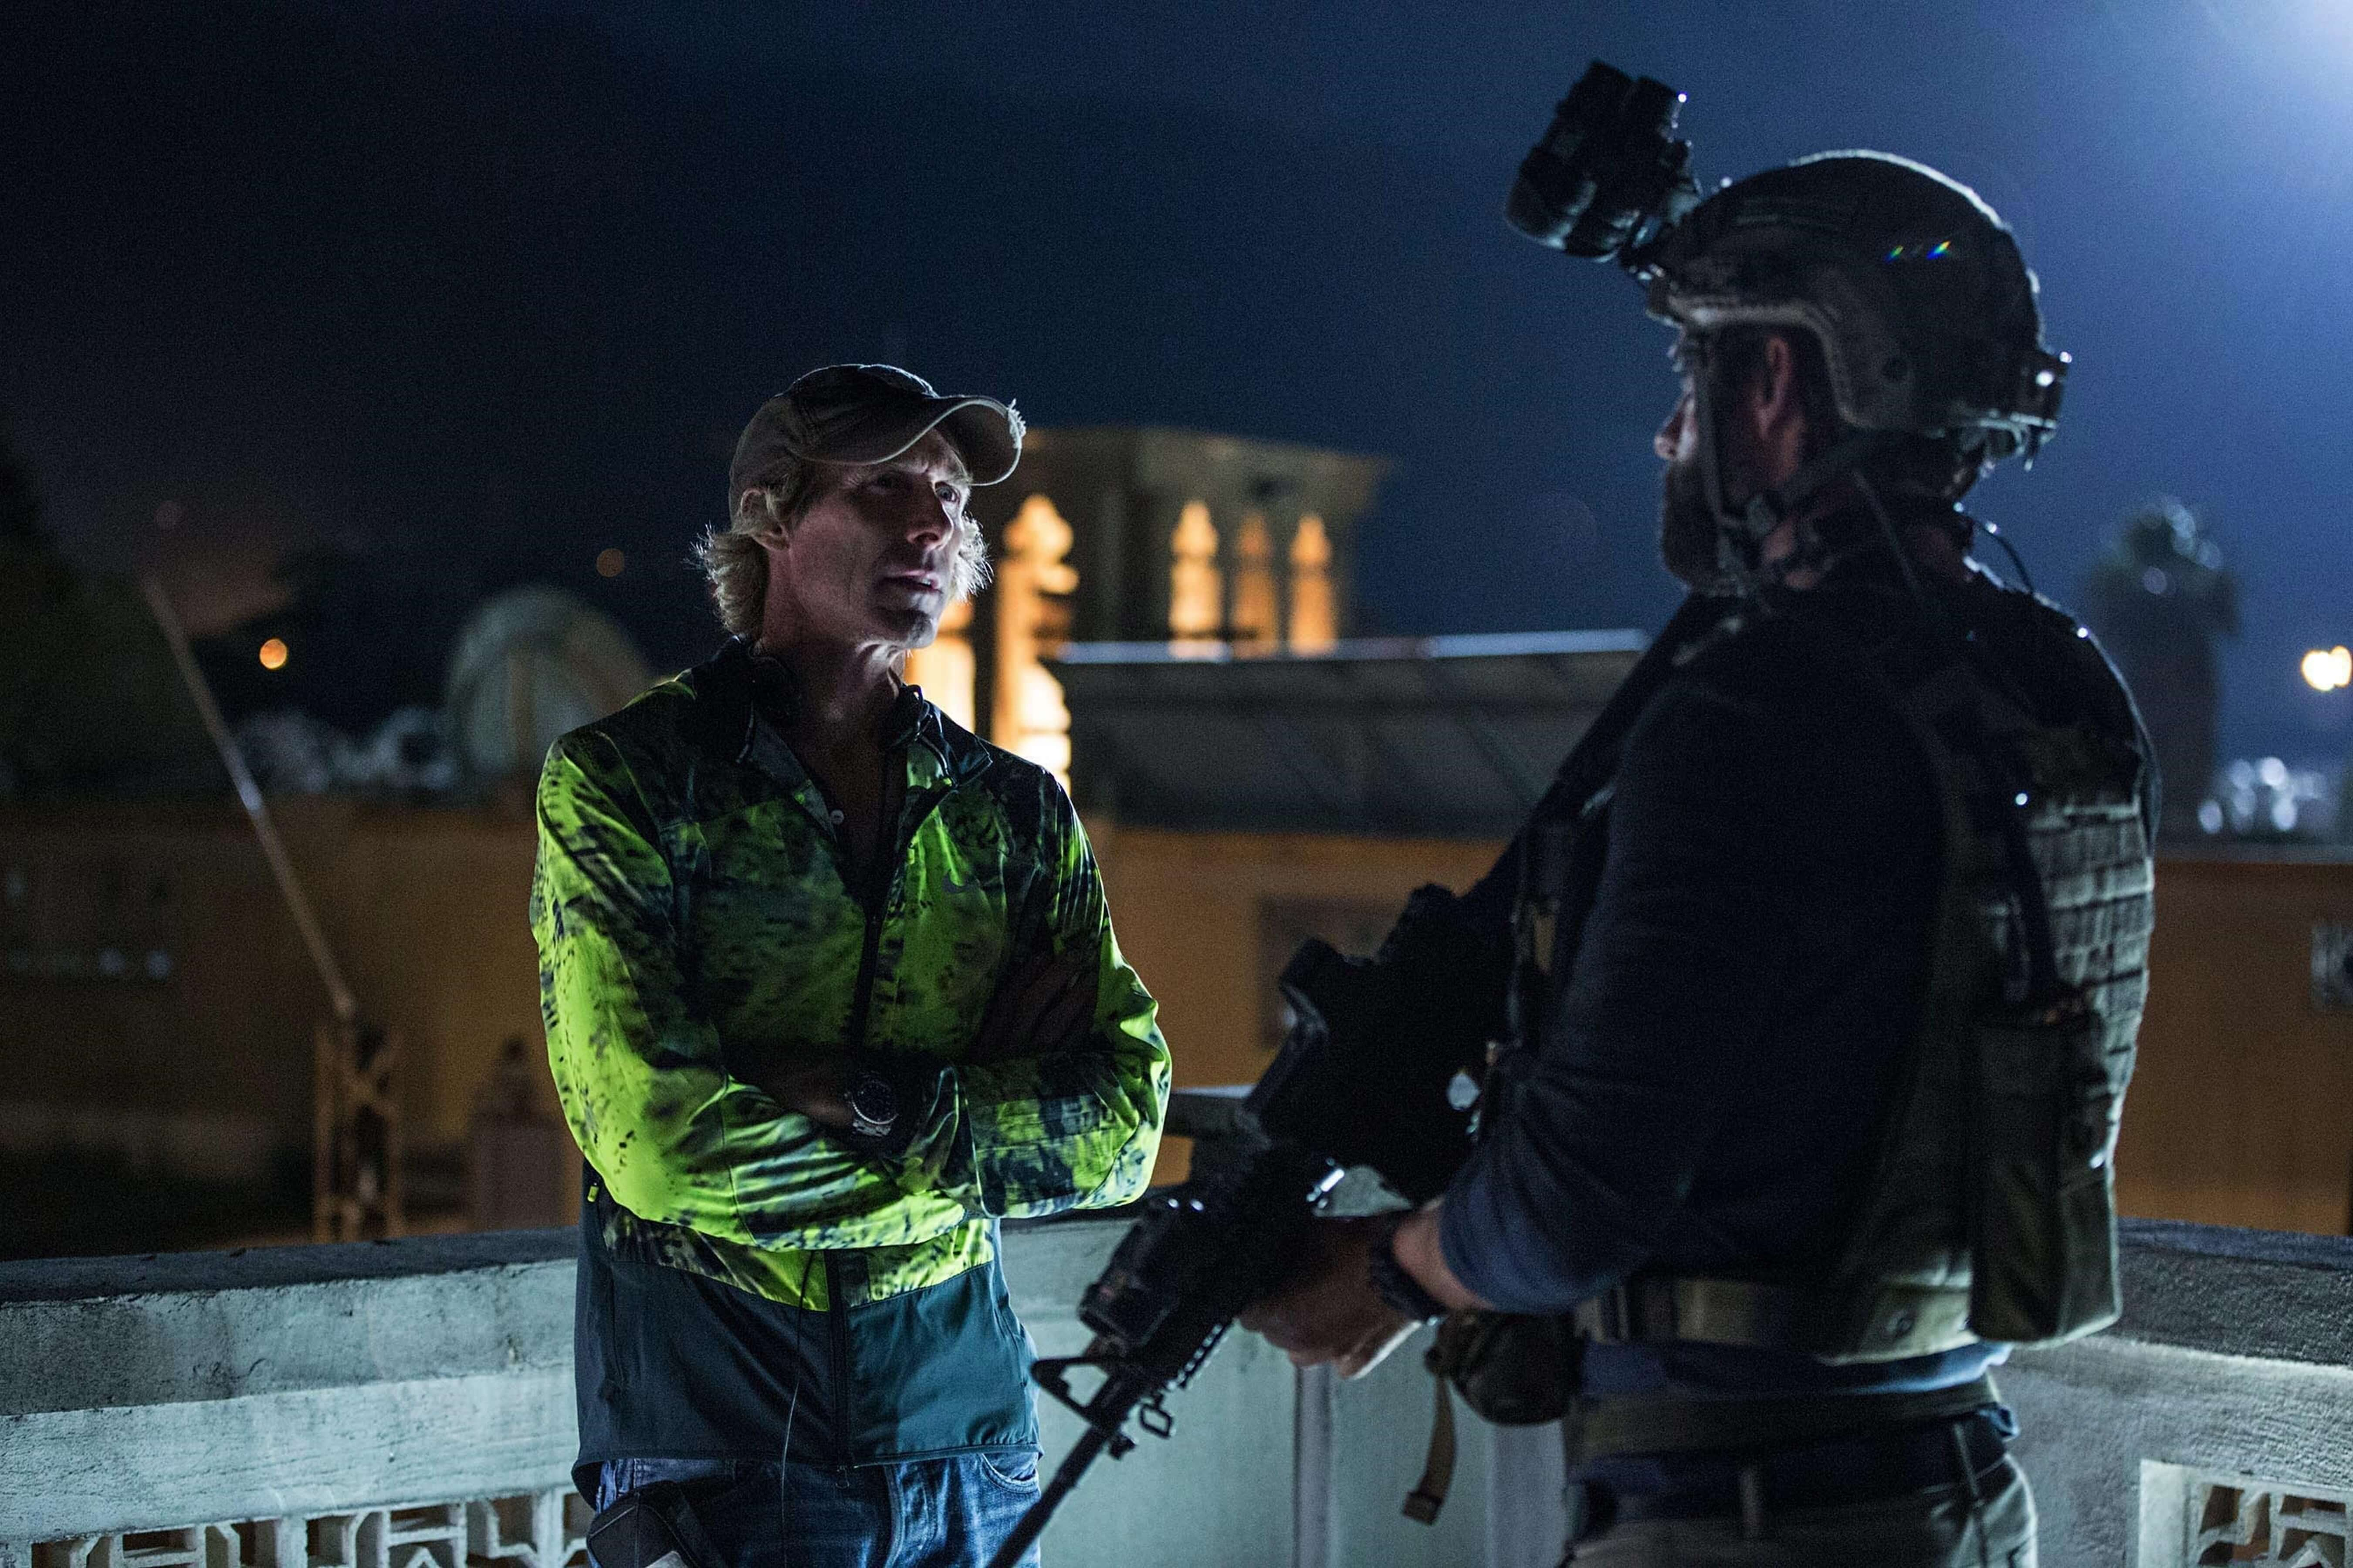 13 Hours The Secret Soldiers Of Benghazi Gi Film Festival